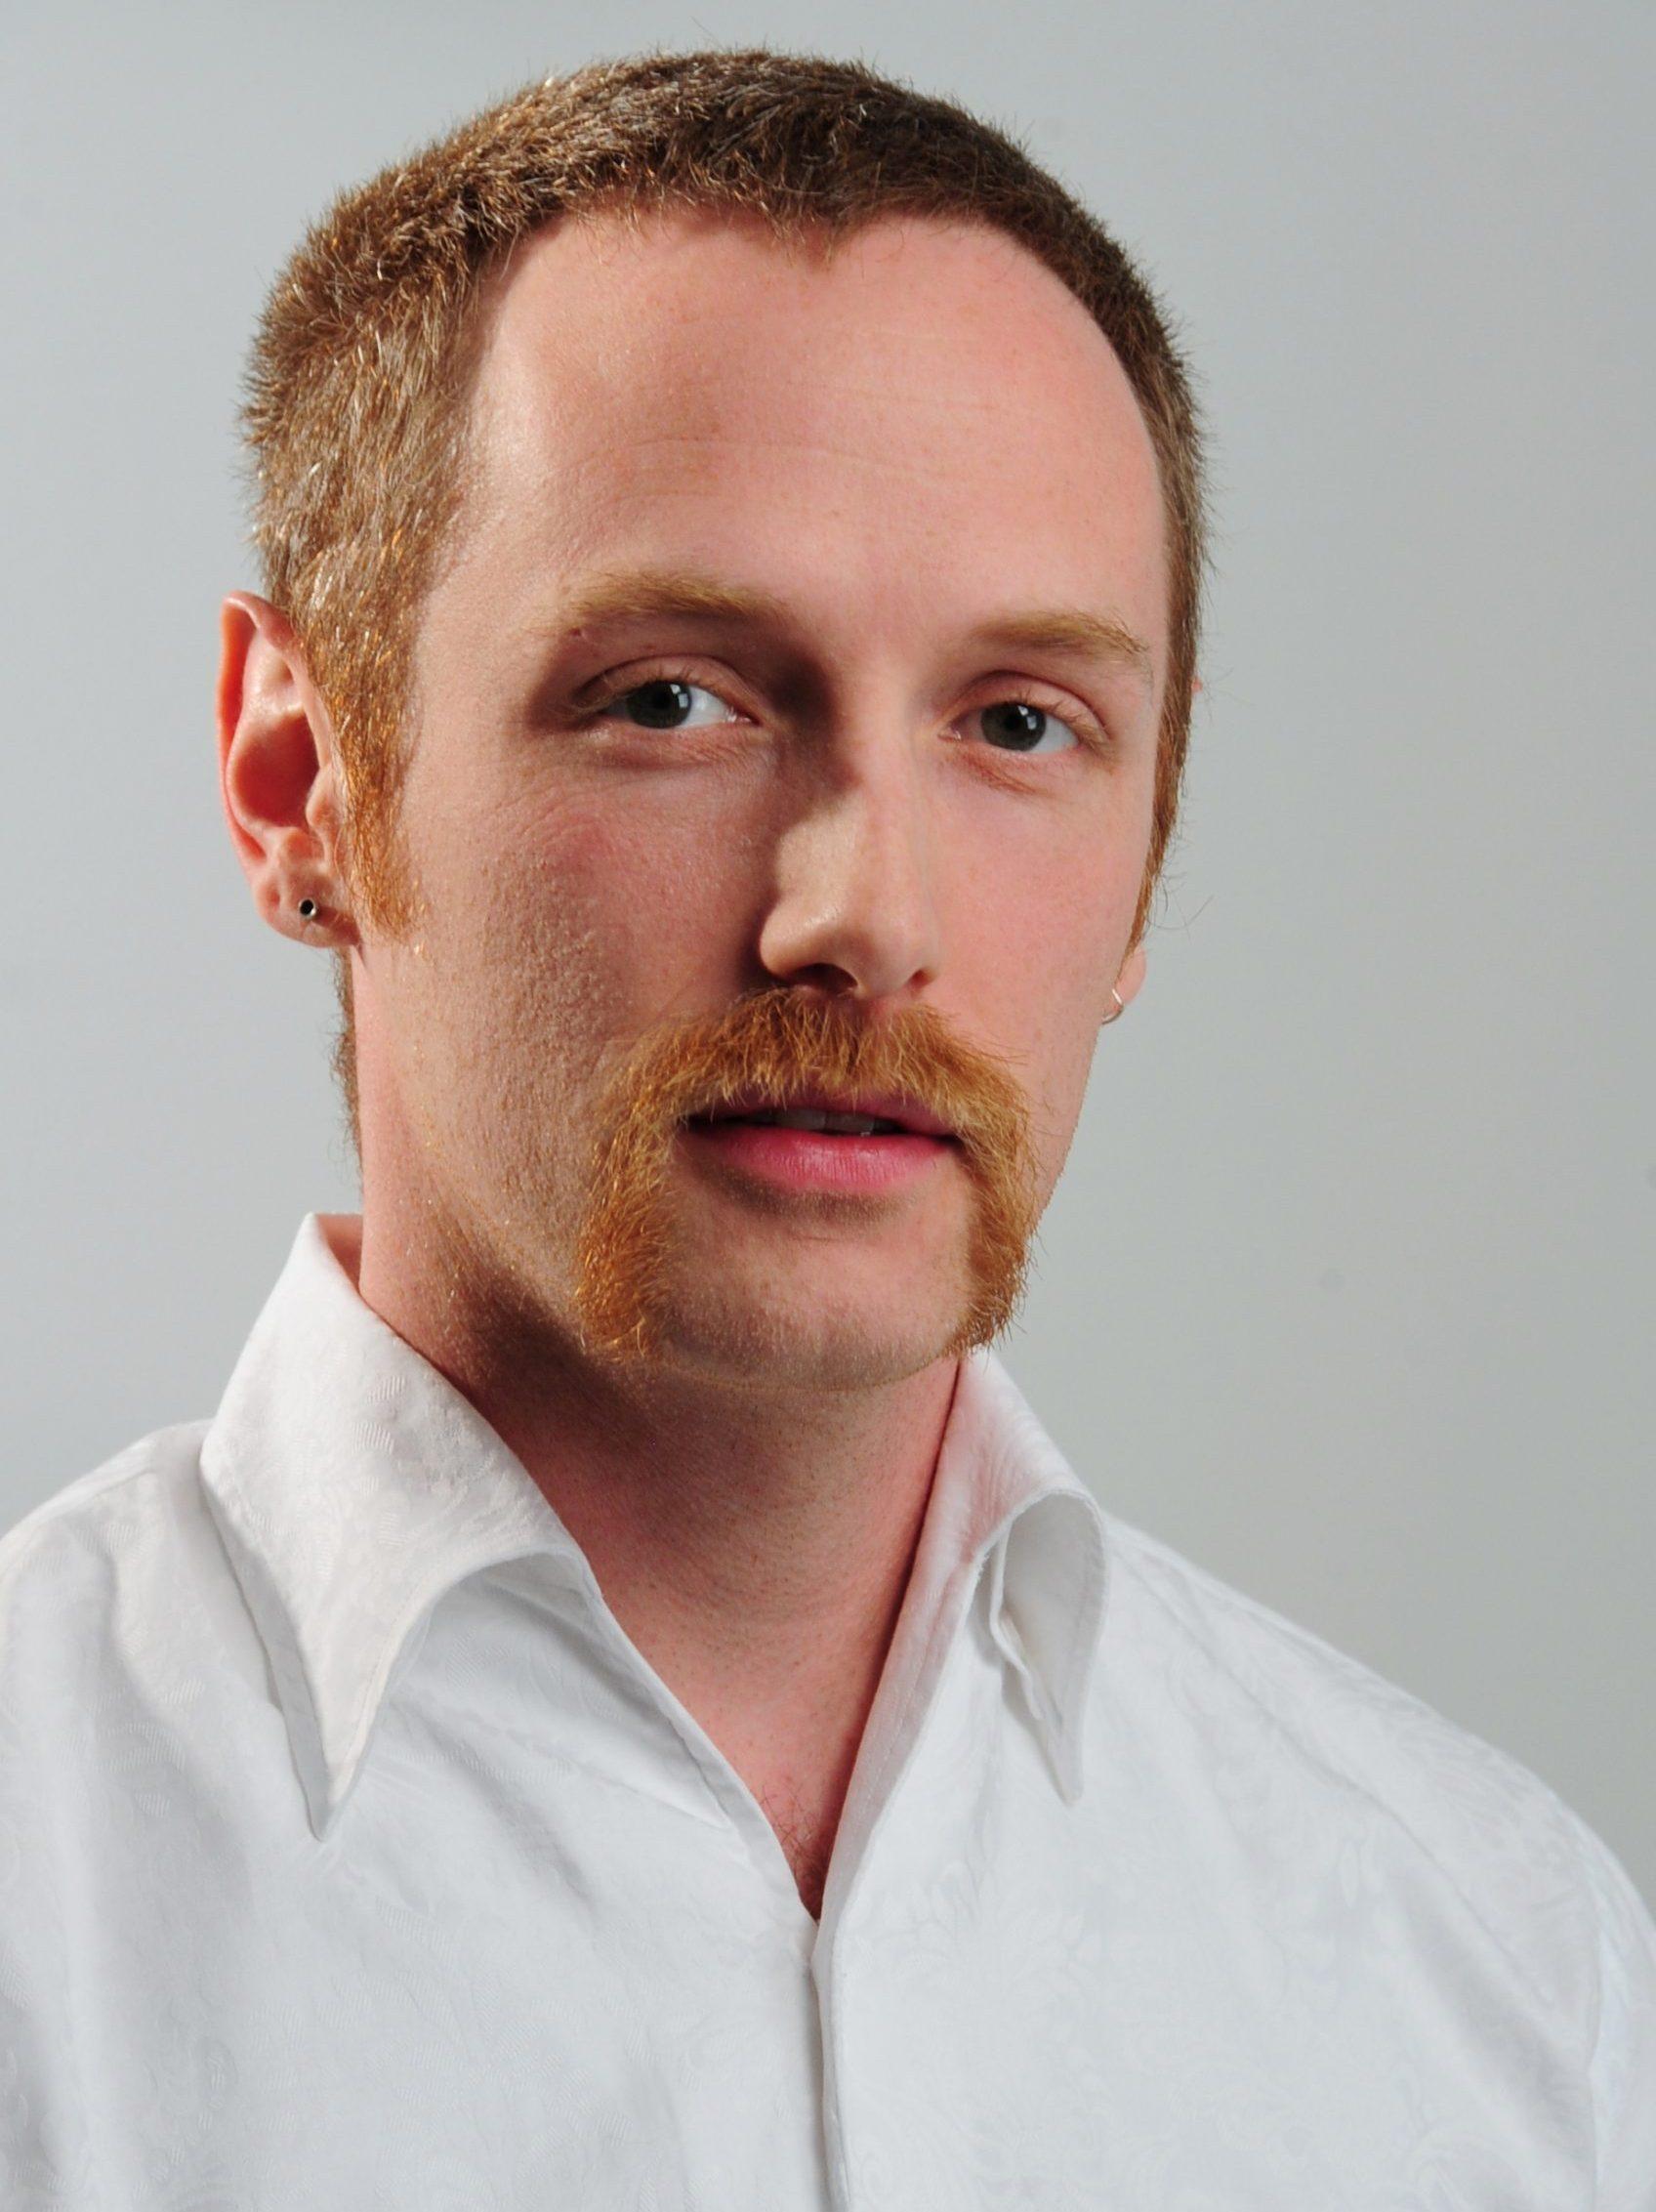 Professional Portrait of Entrepreneur by Hollywood Photo Studio